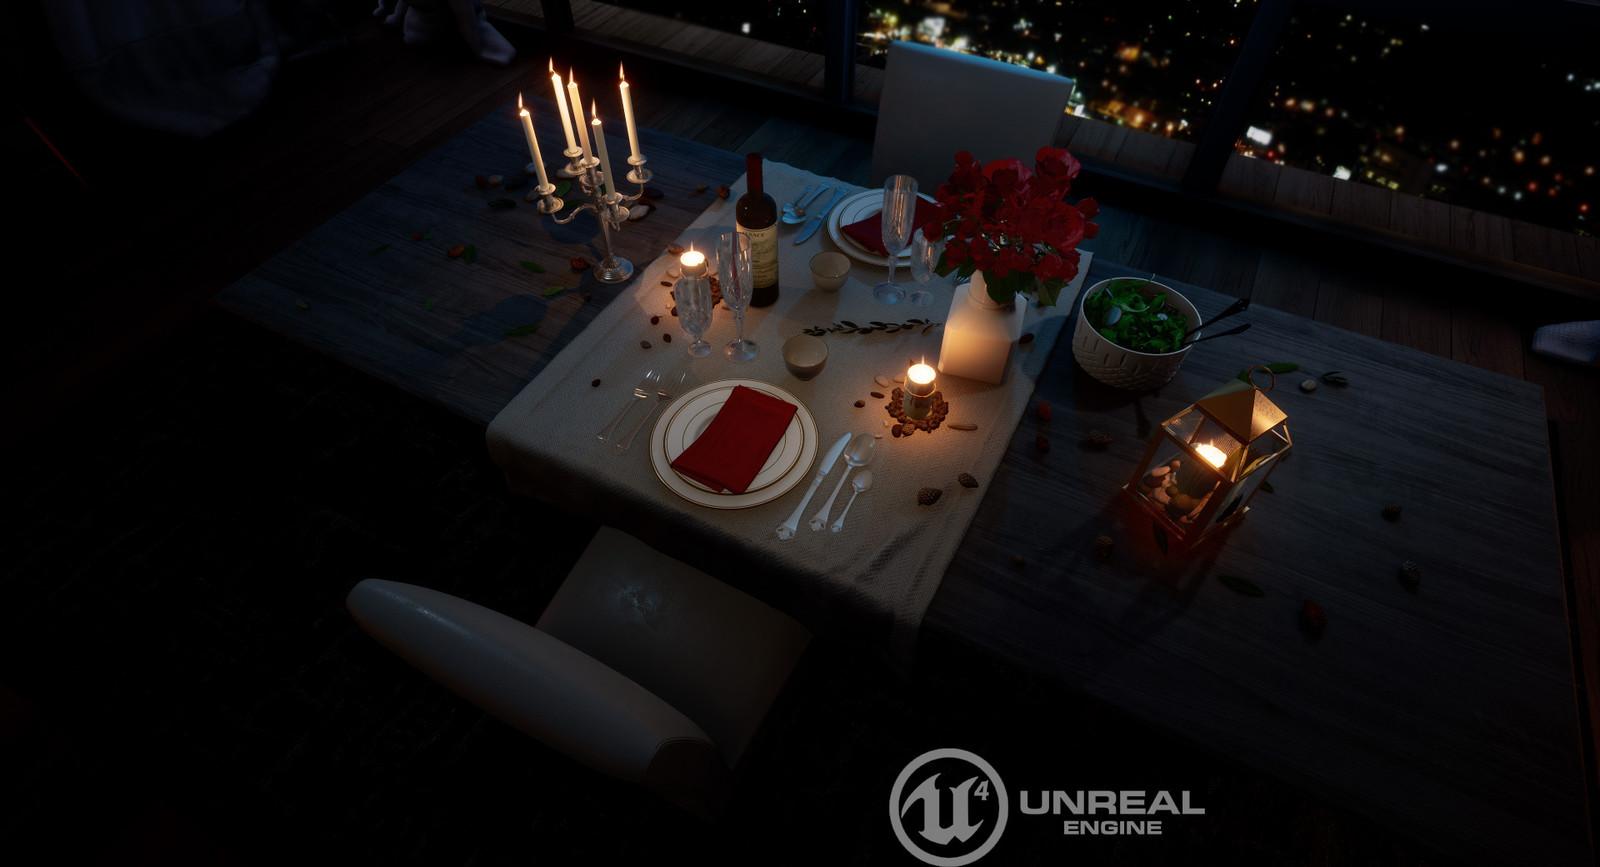 Romantic Dinner - Unreal Engine